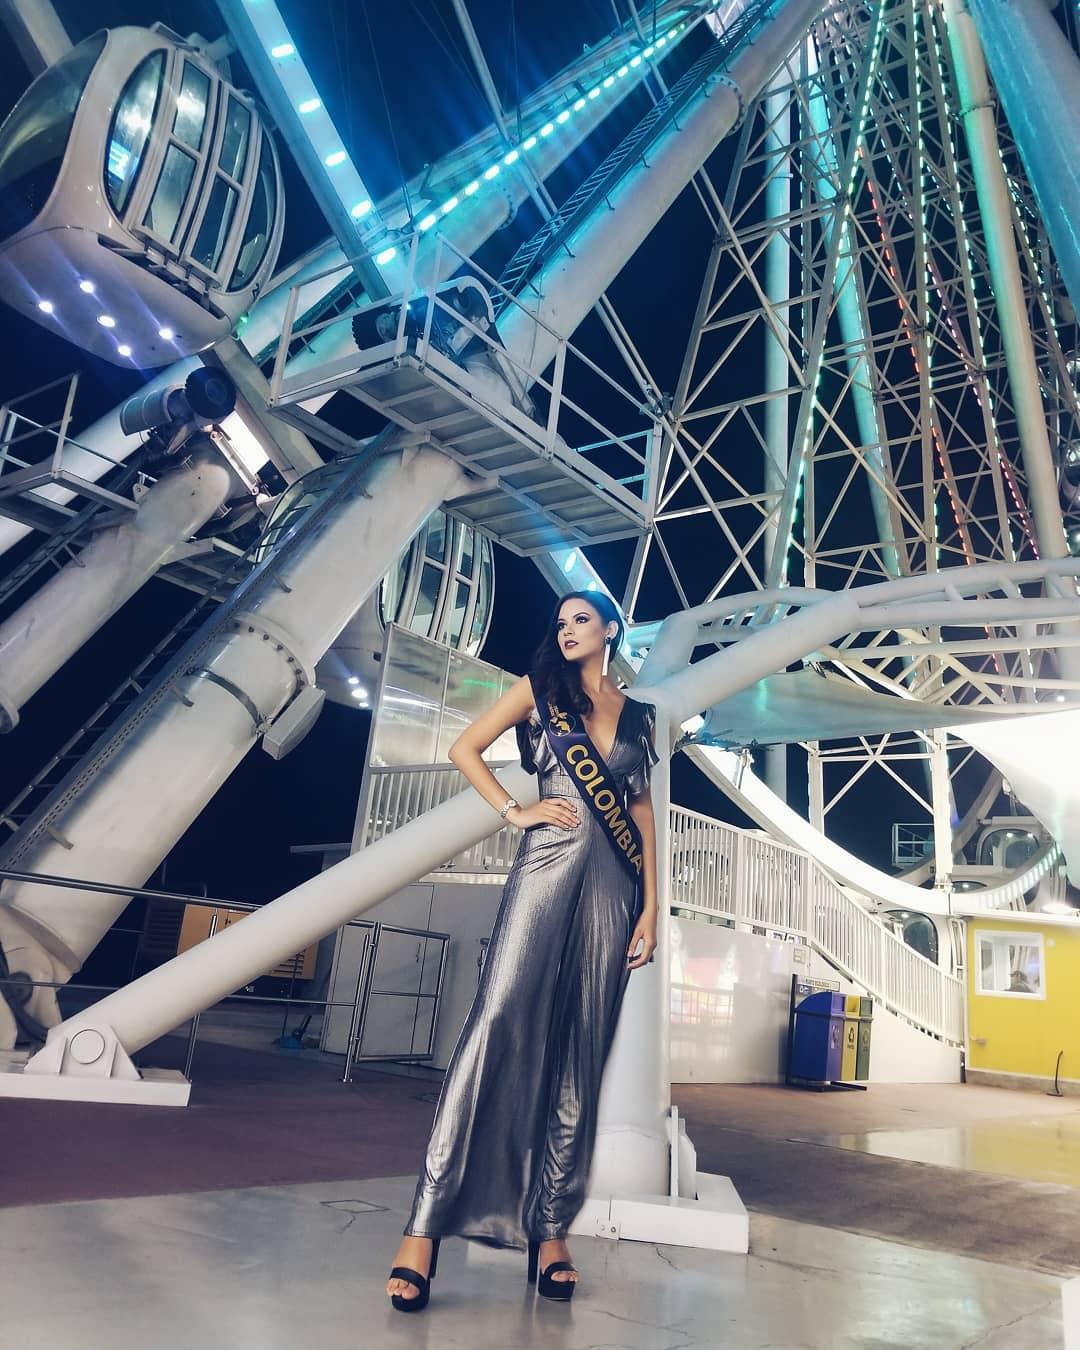 ana catalina mouthon, 2nd runner-up de miss continentes unidos 2018. - Página 2 40083410